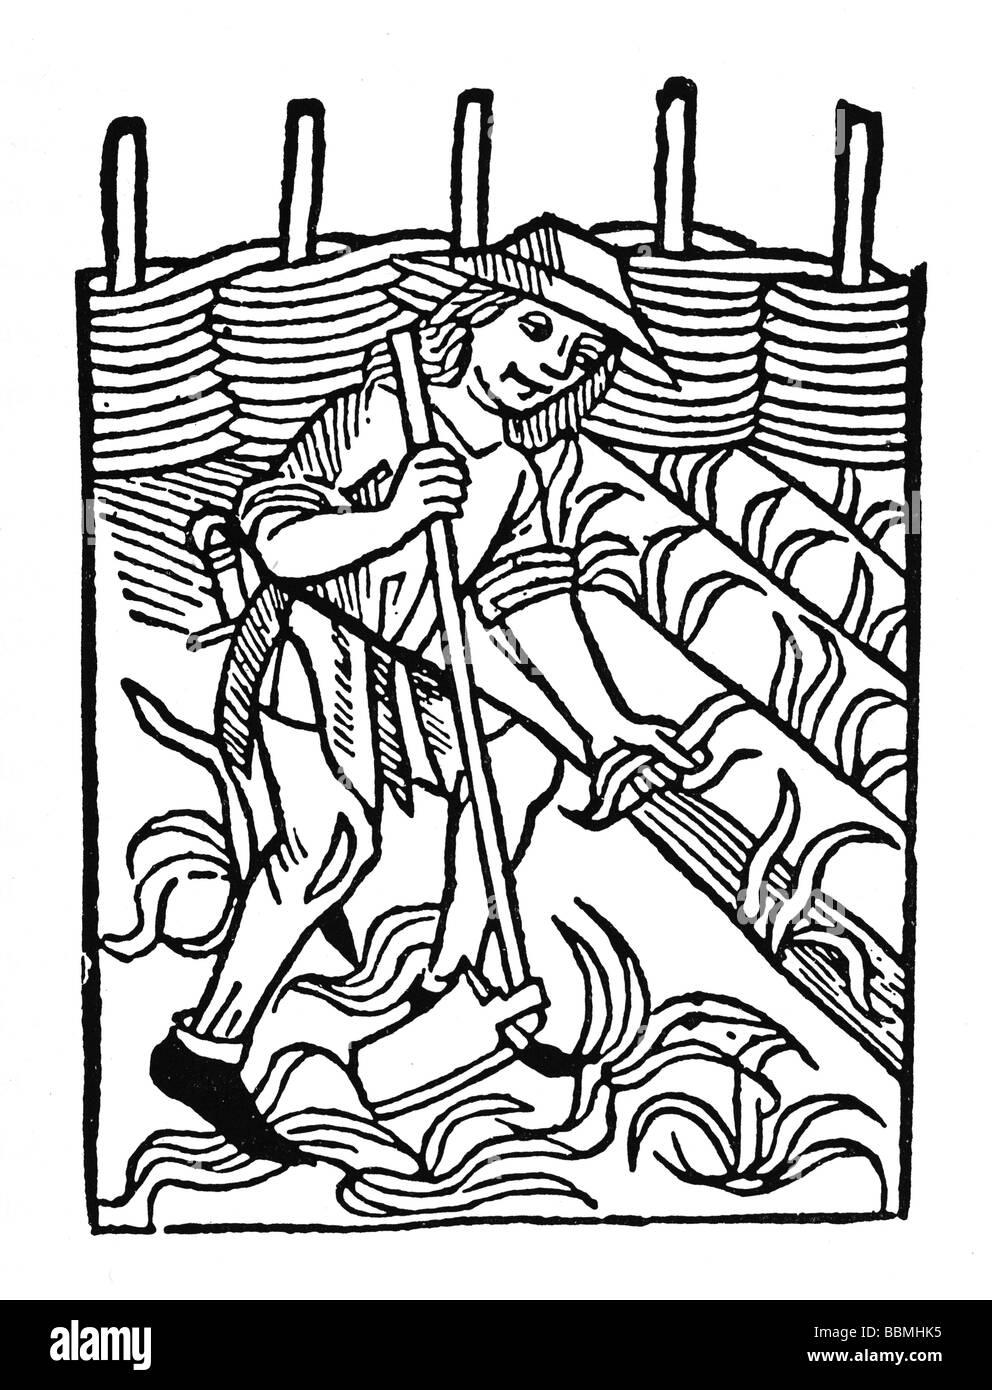 Unkraut hacken, Holzschnitzerei aus dem Mittelalter Stockfoto